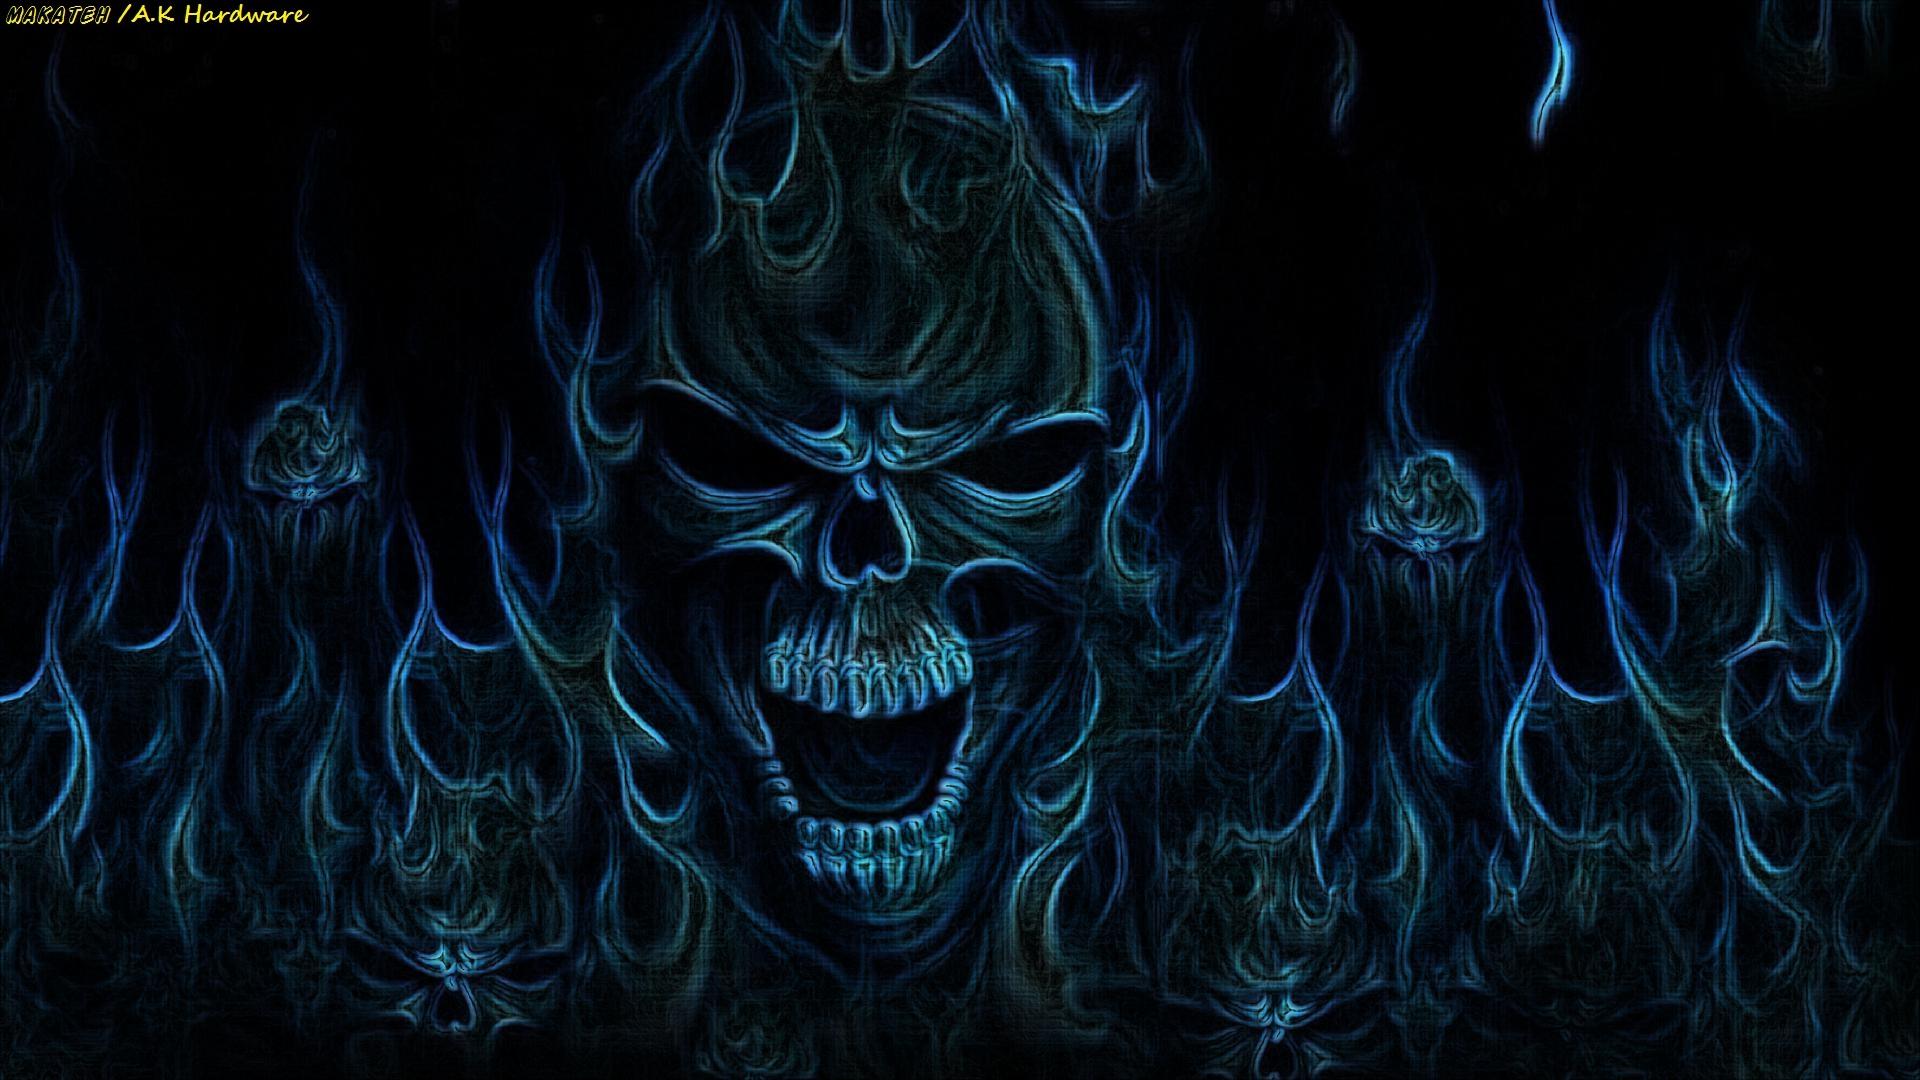 Incredible Neon Skull Wallpaper: 1920X1080 Skull Wallpaper